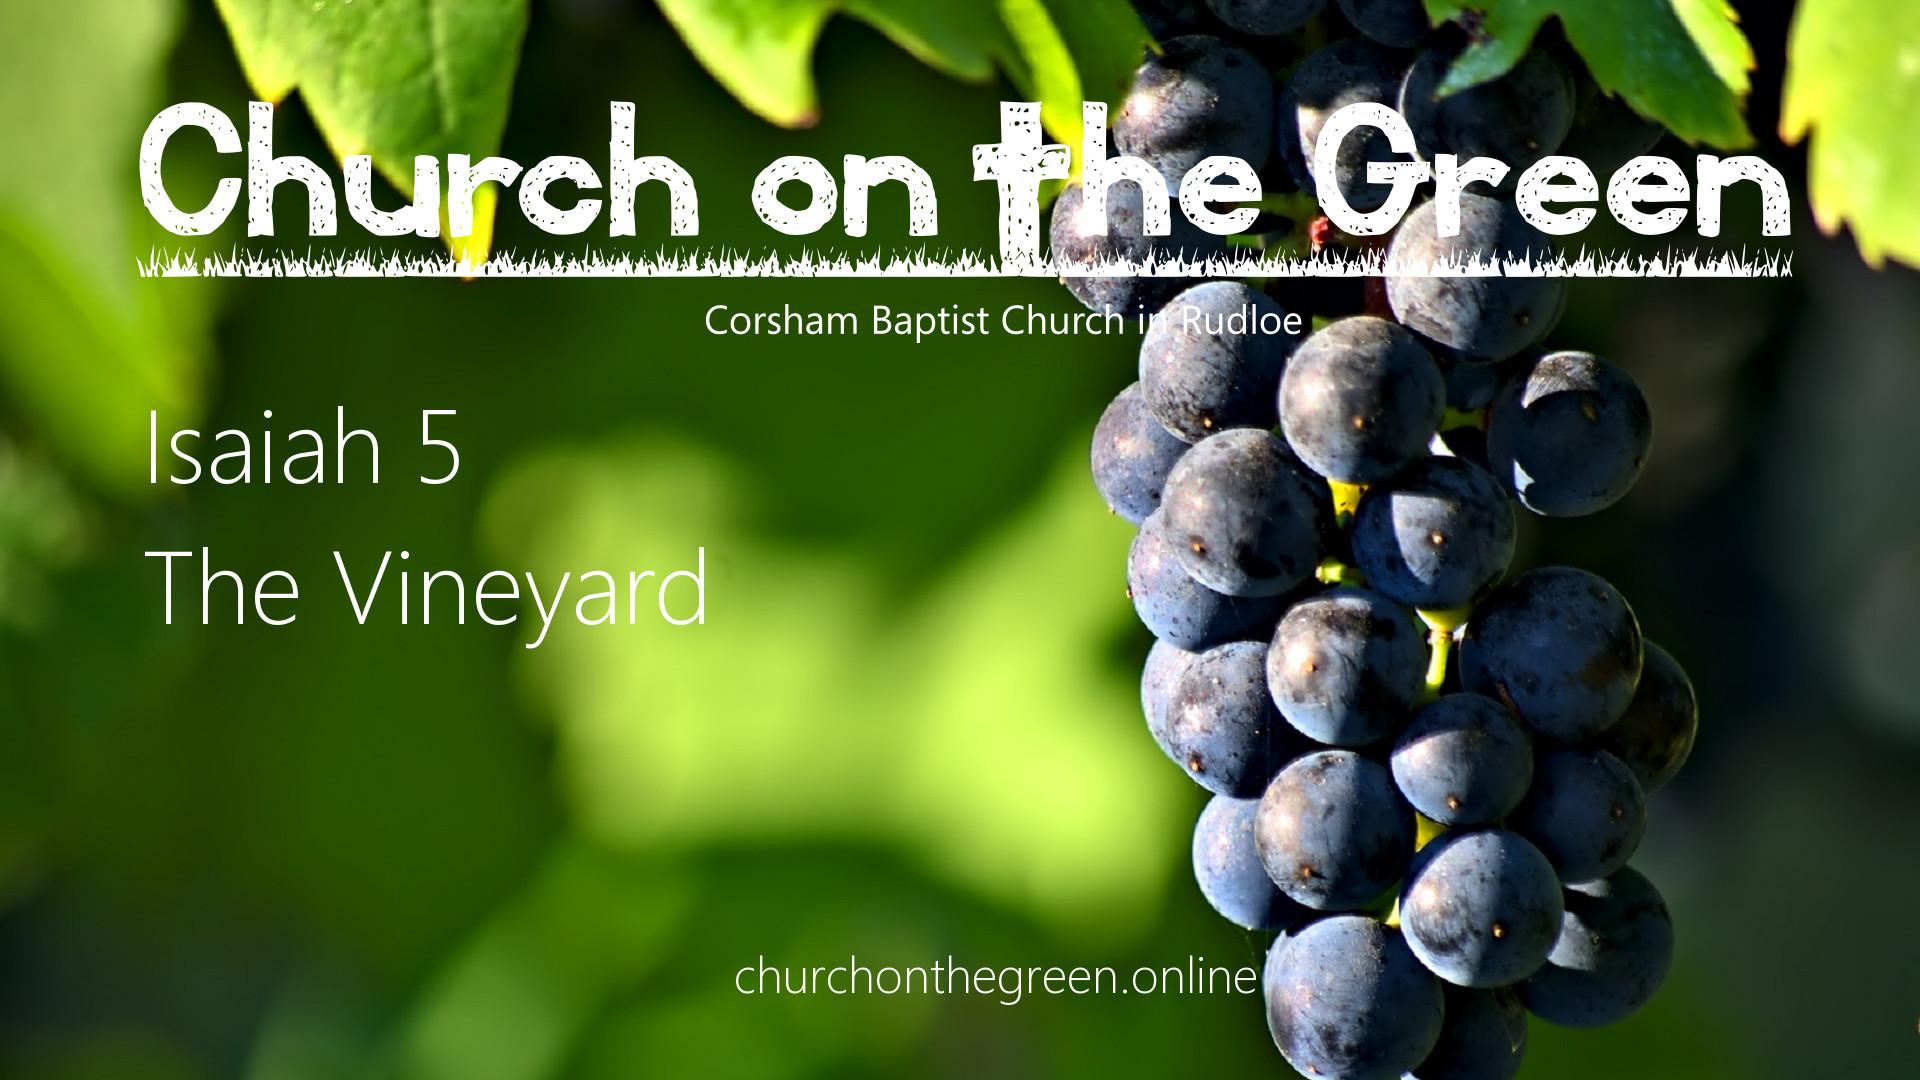 Isaiah 5: The Vineyard